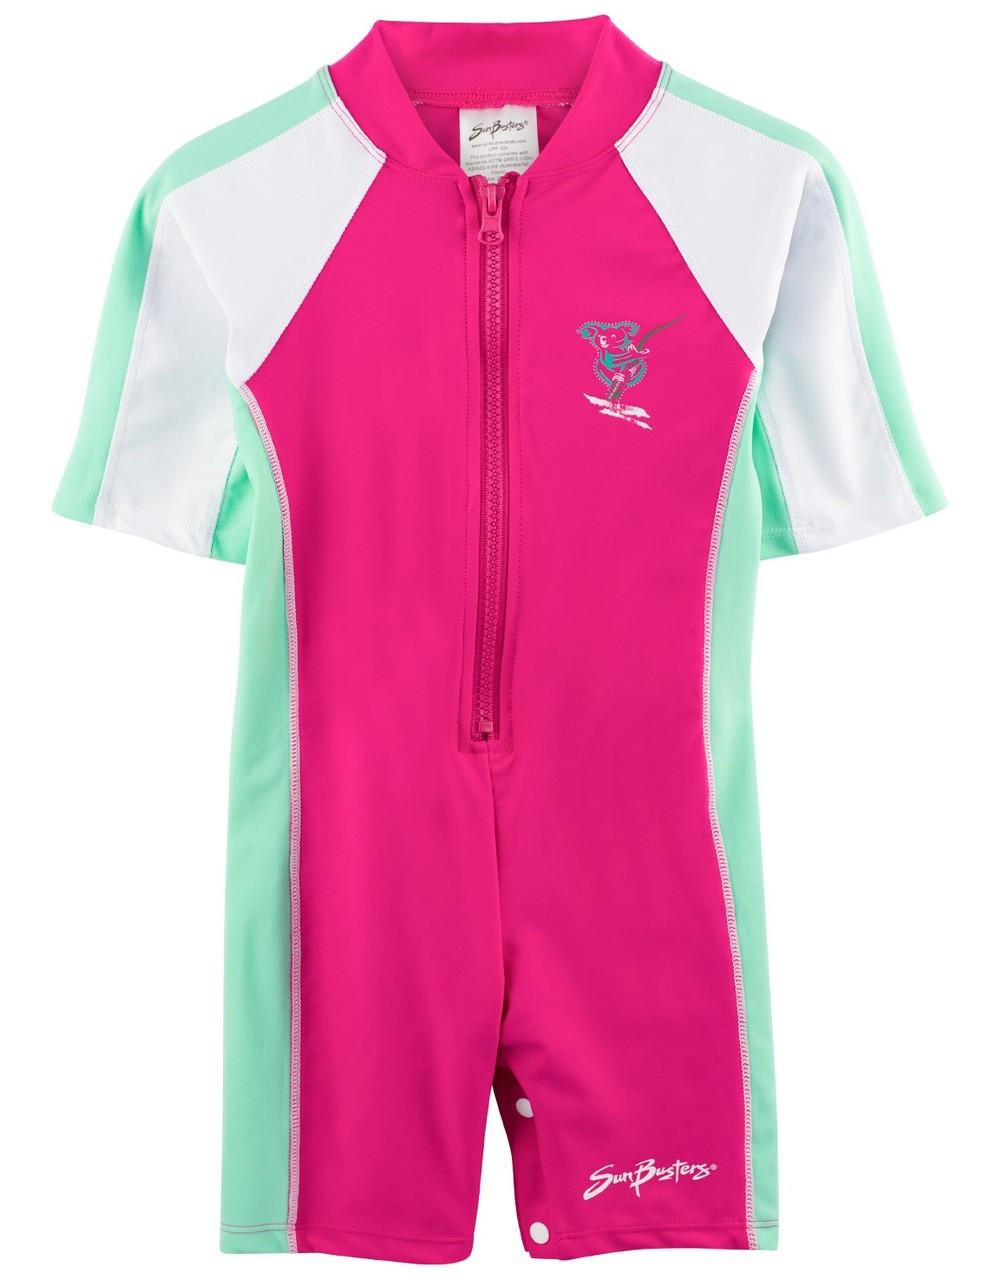 4fc2d33cb0181 Girls Sun Busters S/S UV 1-Piece Swimsuit Poppy | Girls UV Swimwear